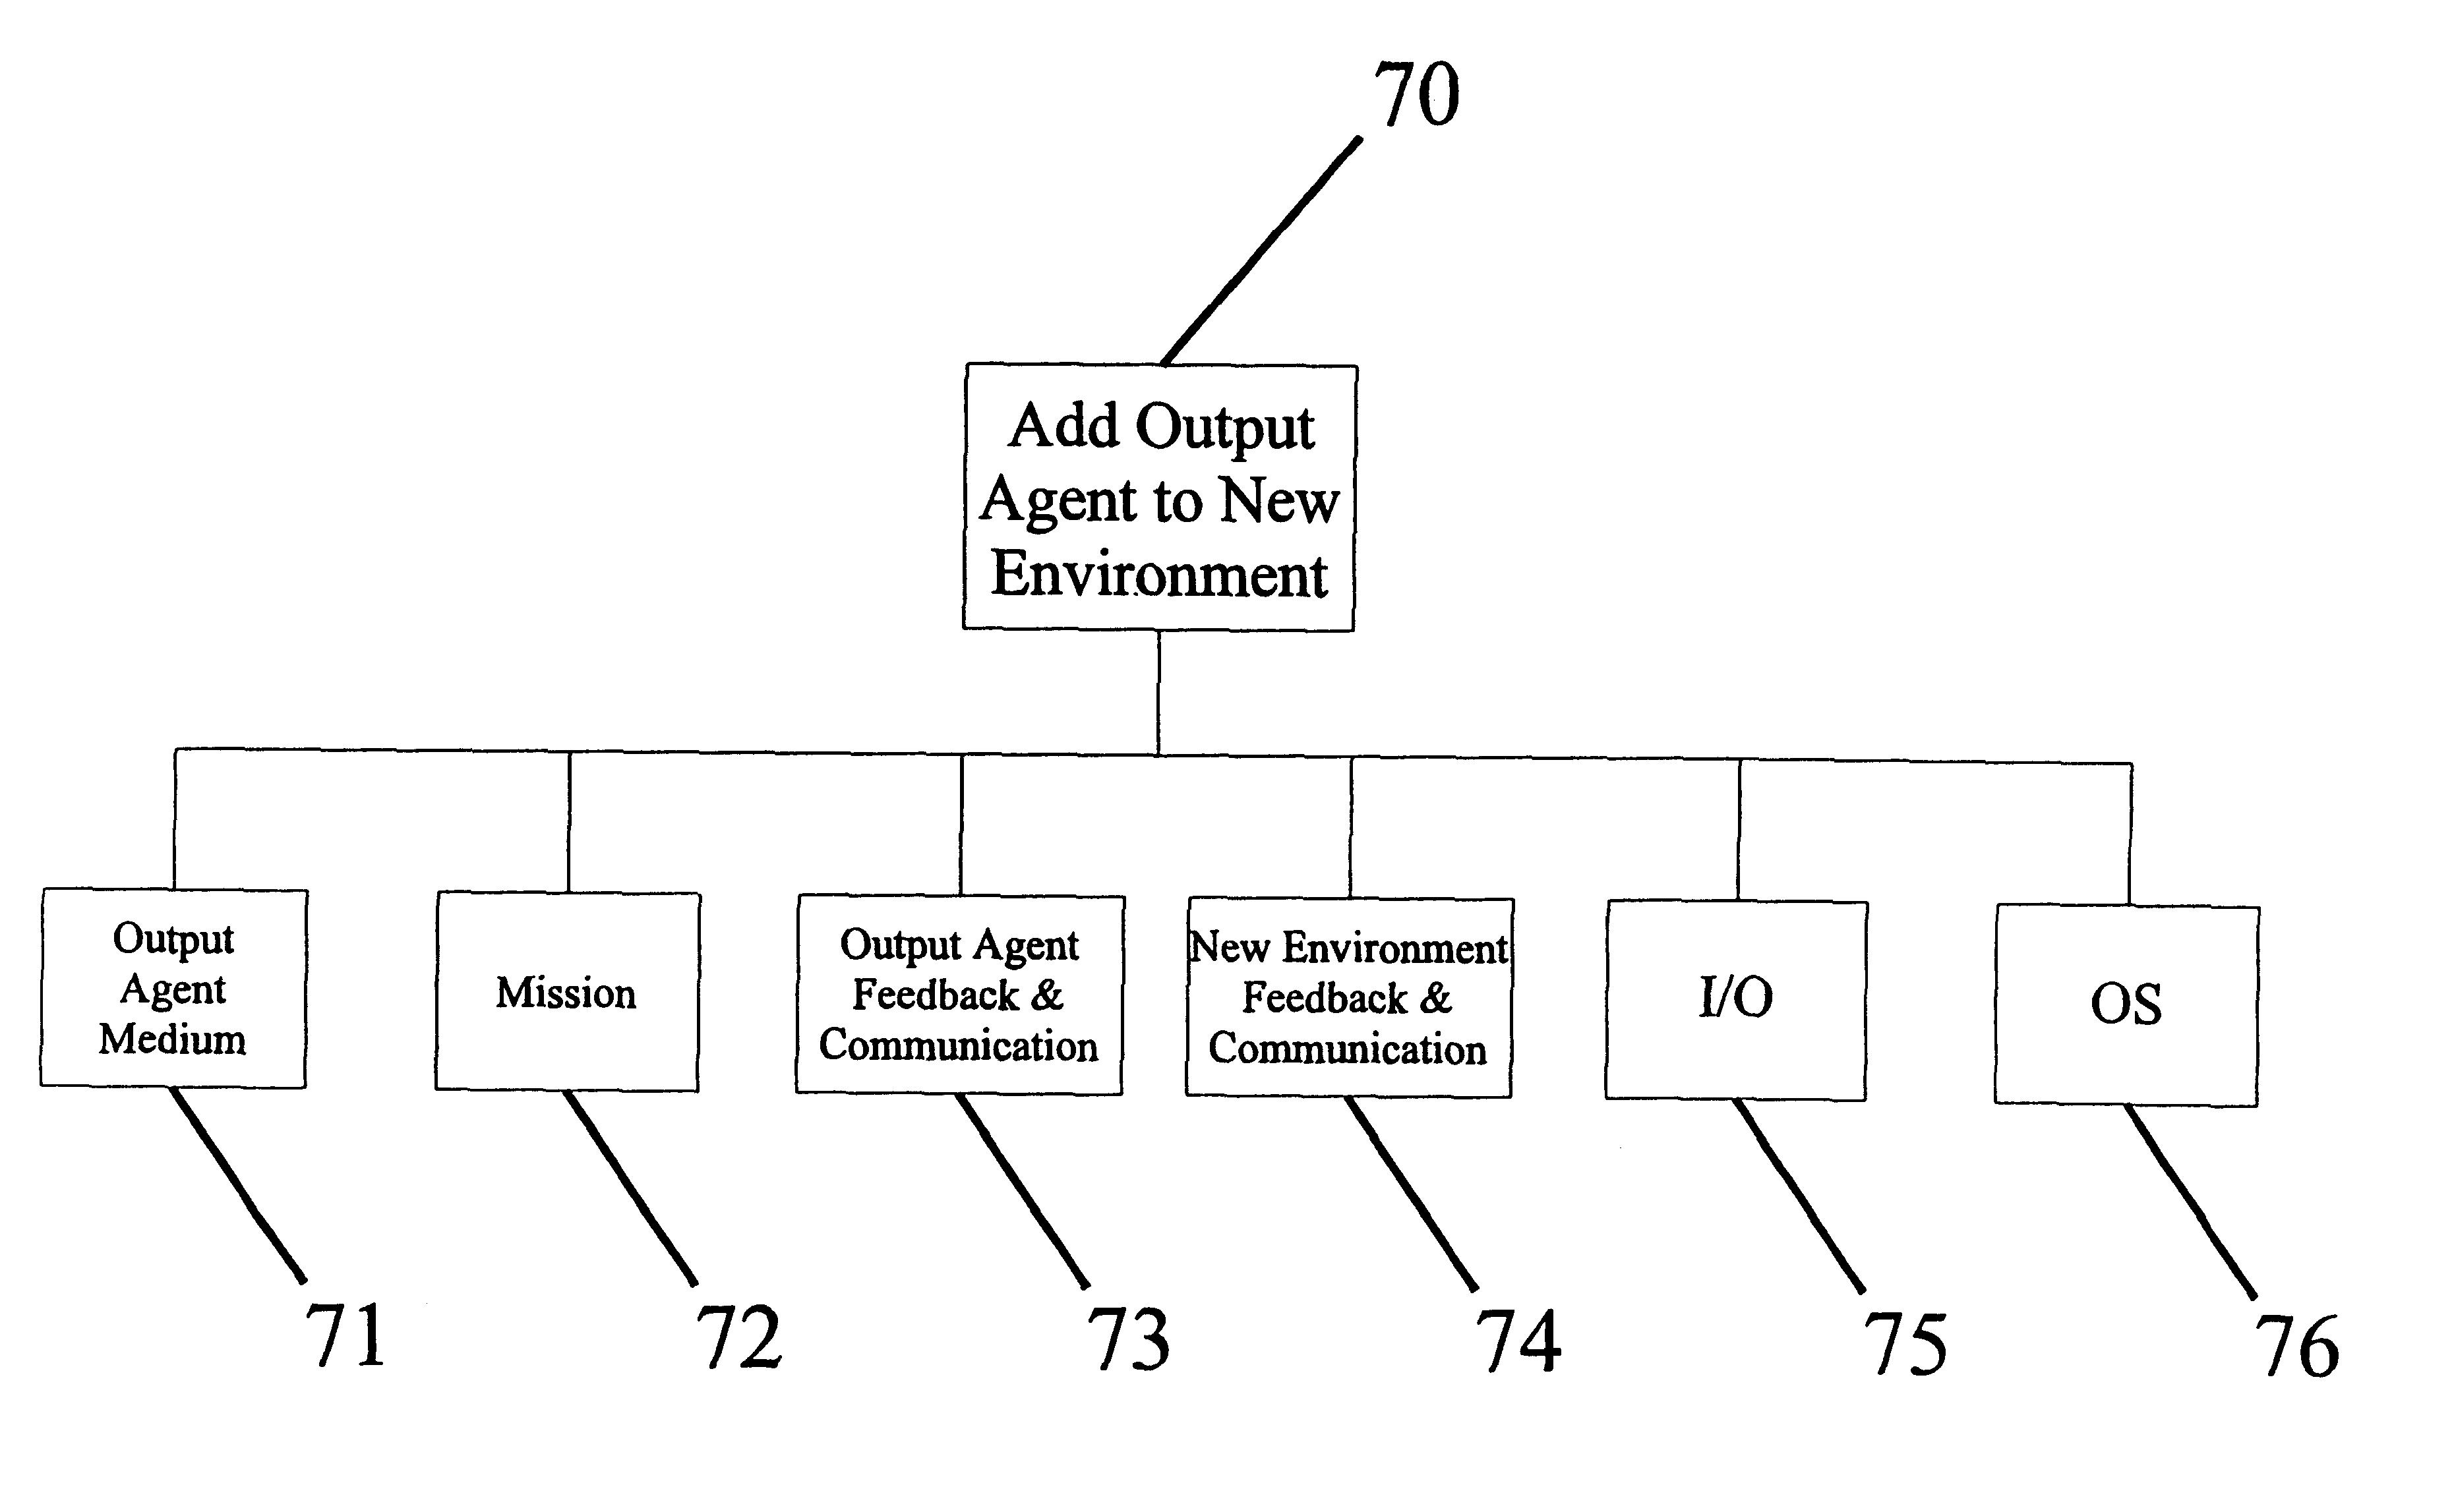 Patent US 6,292,830 B1